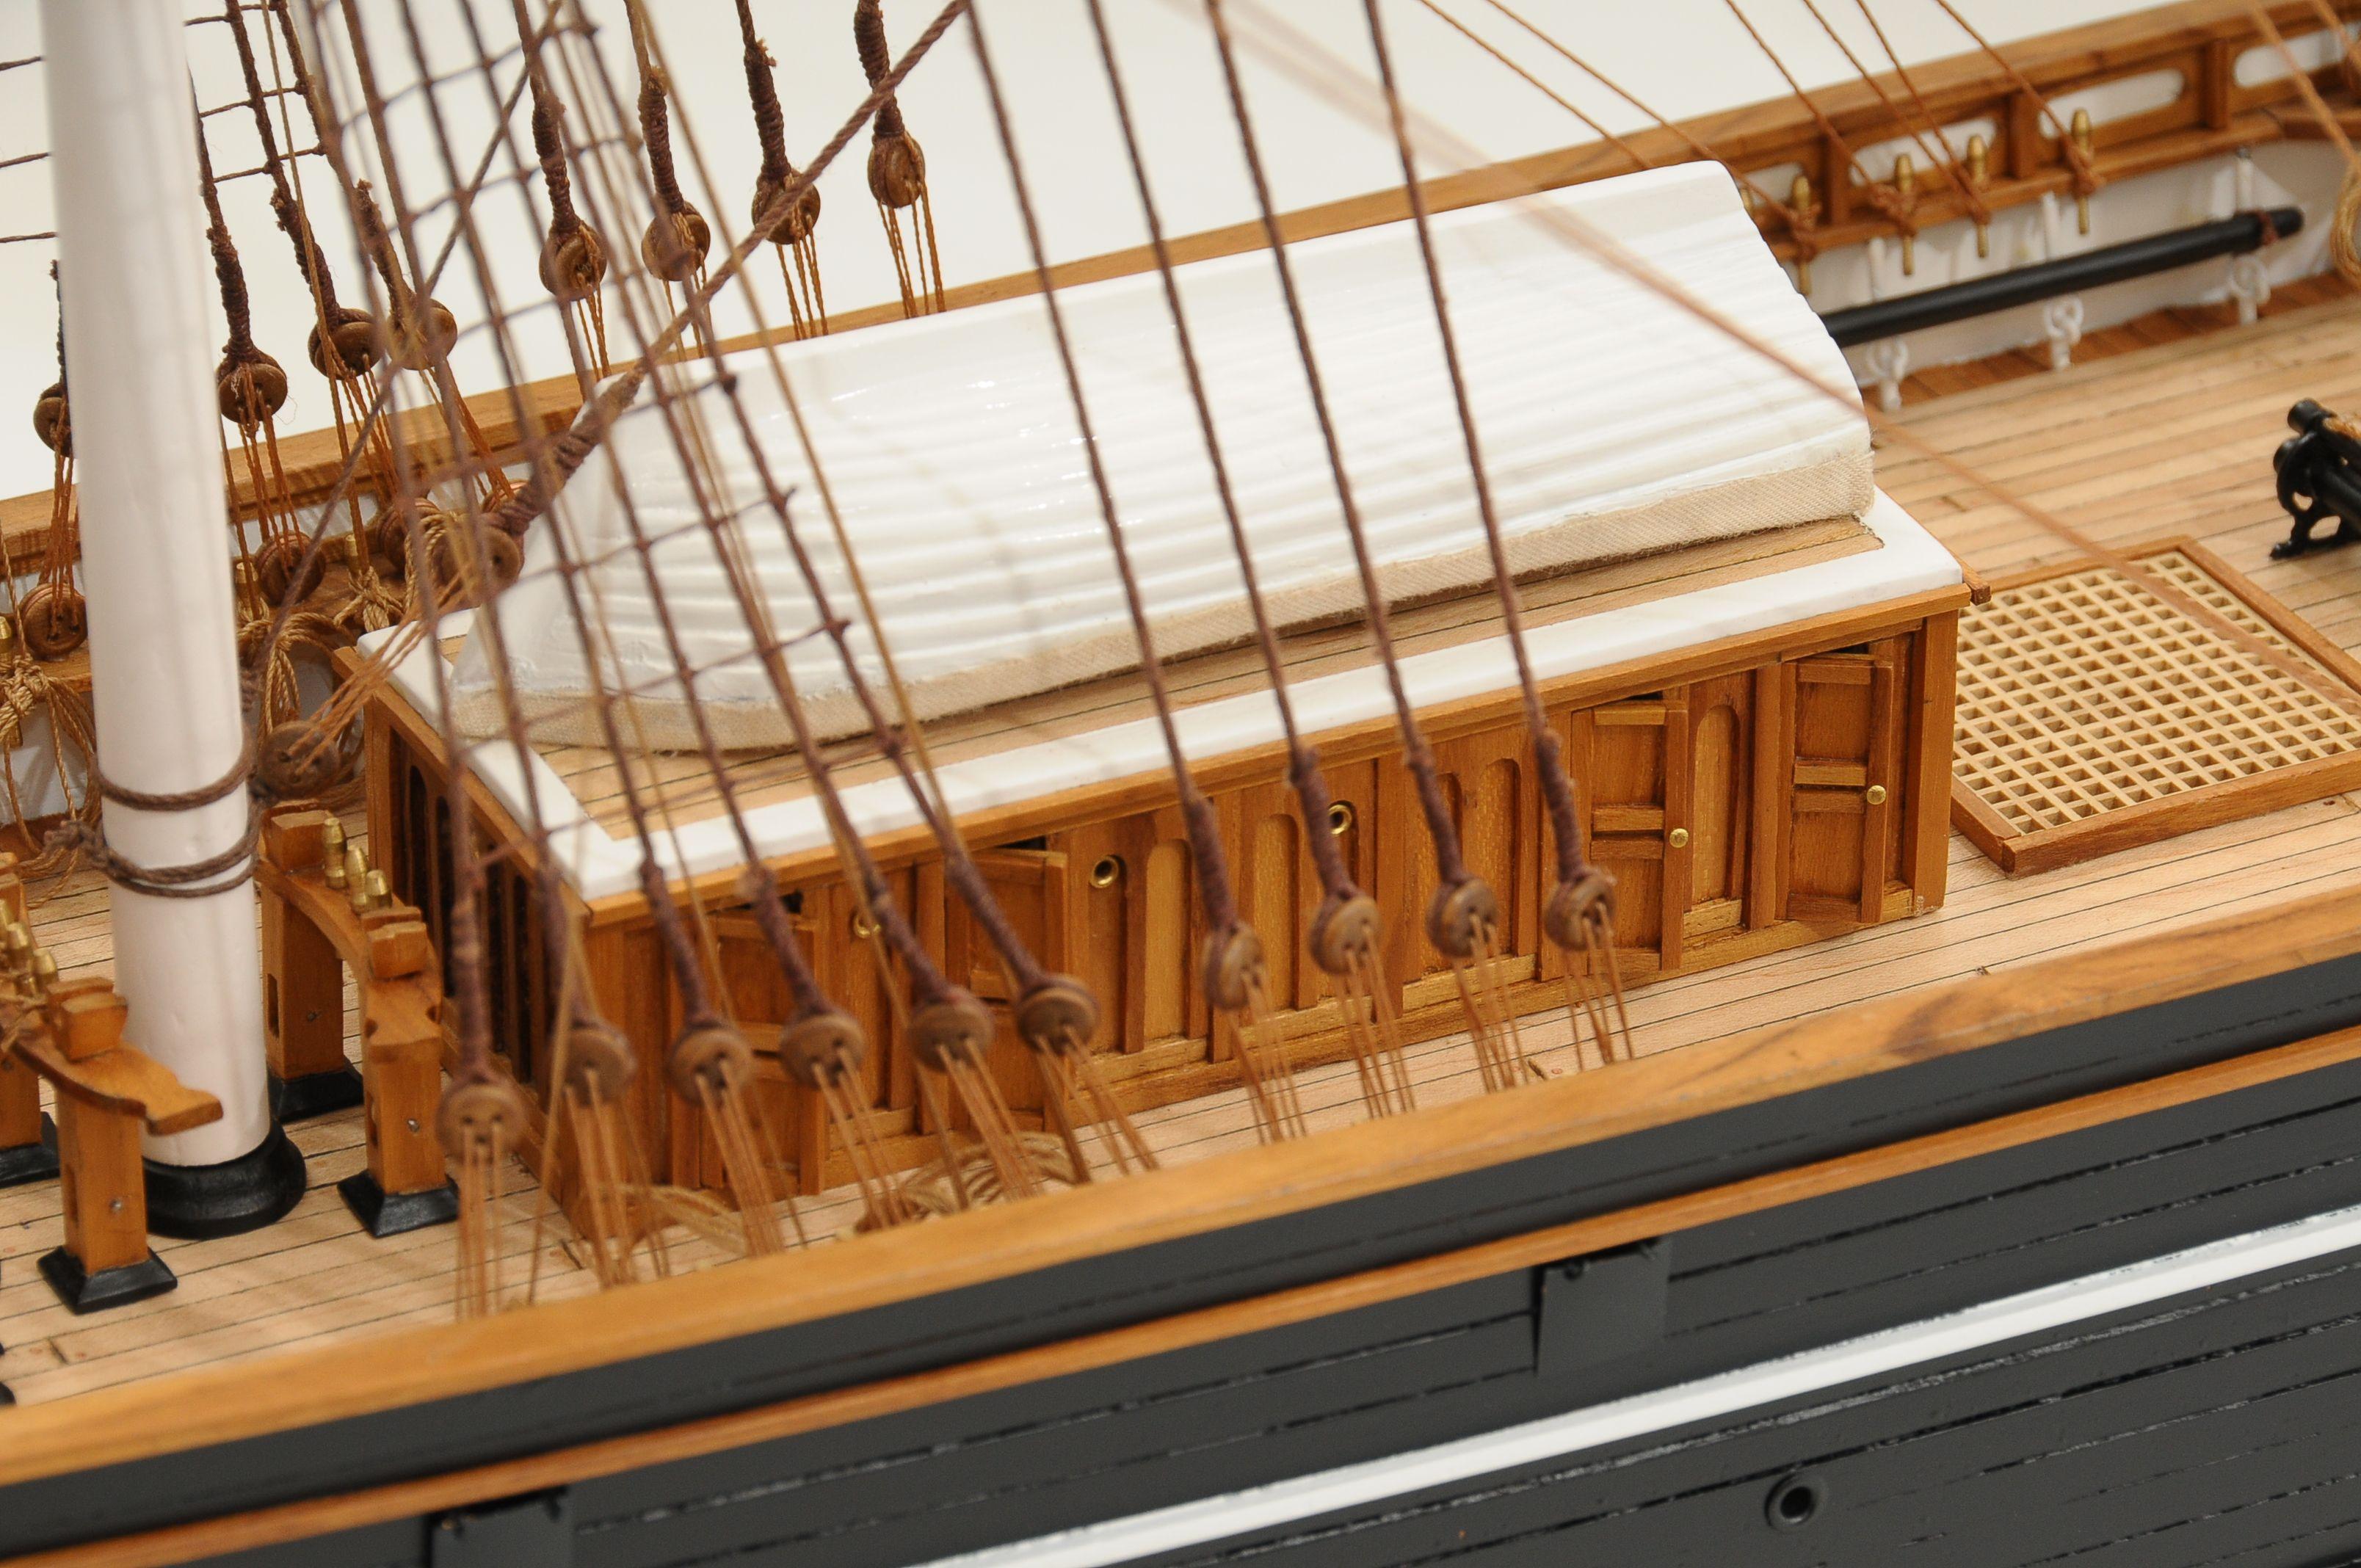 553-8673-Cutty-Sark-model-ship-Premier-Range